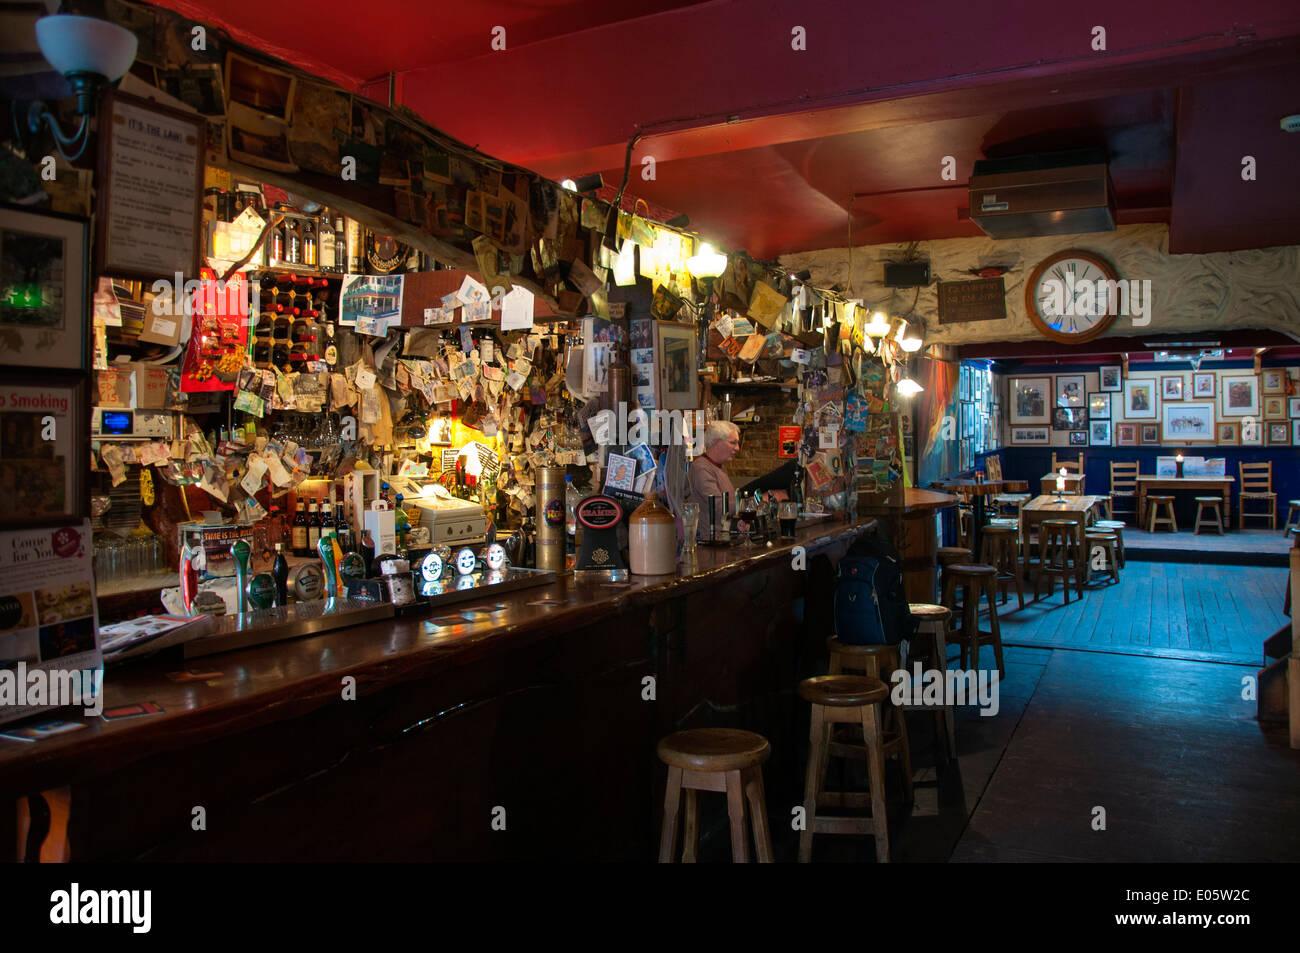 Coburg Bar Stockfotos & Coburg Bar Bilder - Alamy